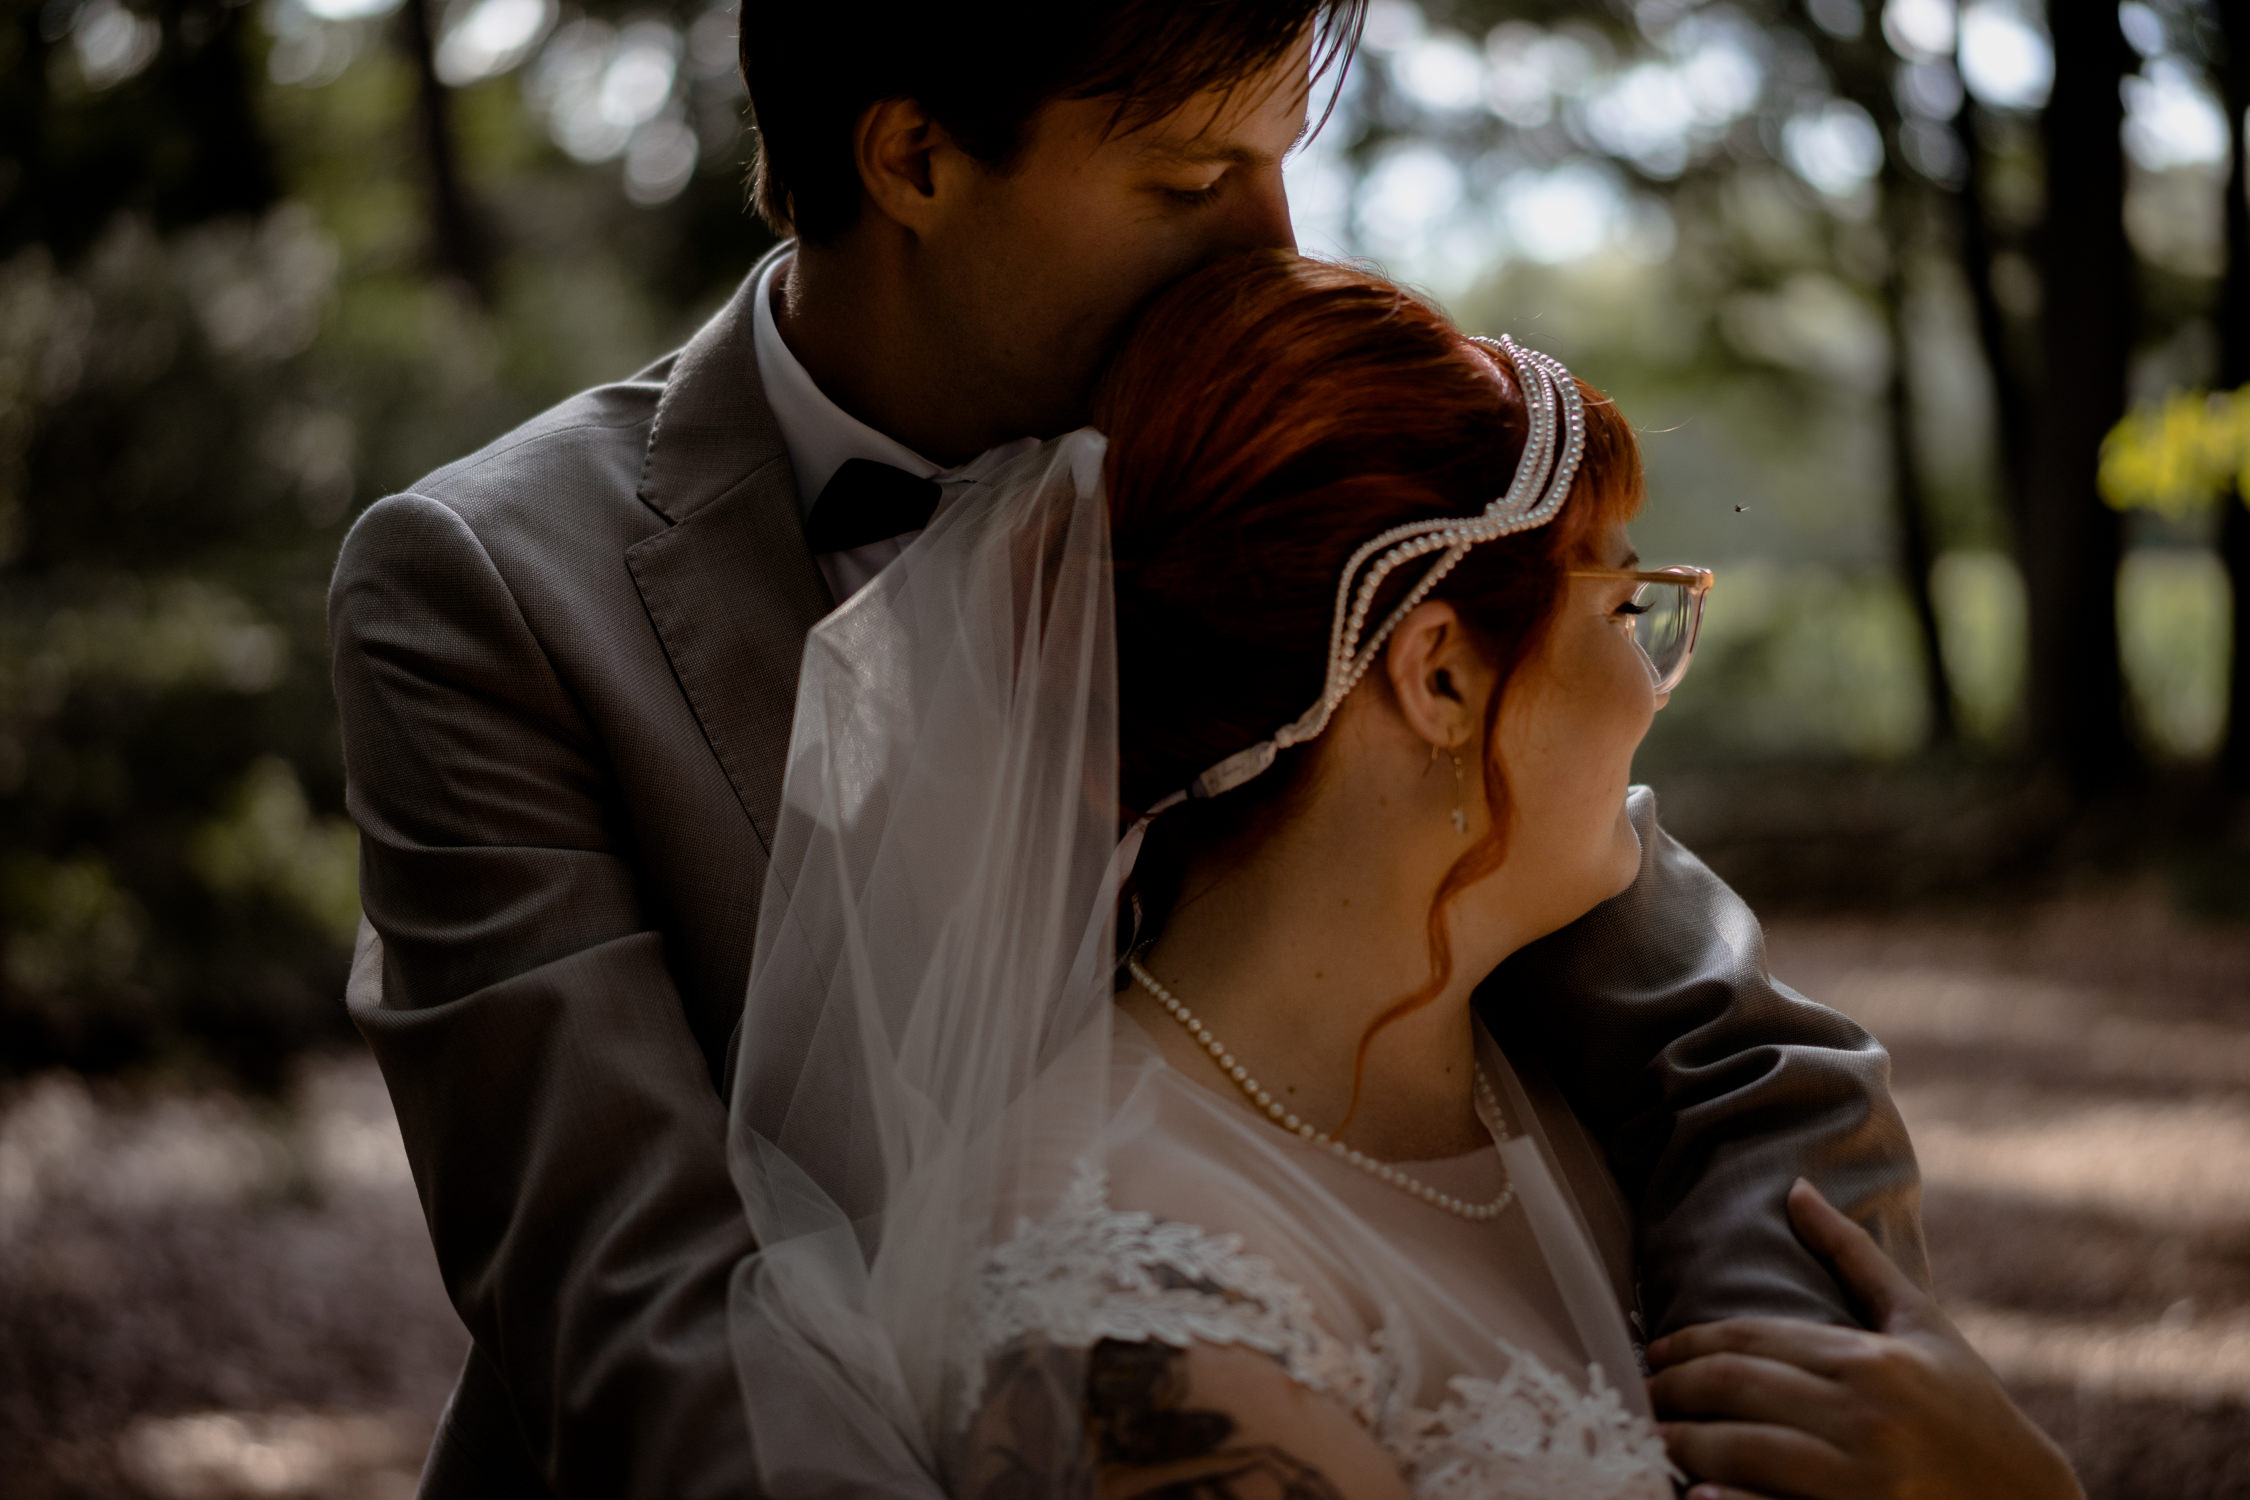 amsterdam-wedding-photographer-bruidsfotografie-trouwfotograaf-mark-hadden-Lucie-Luuk-222.jpg